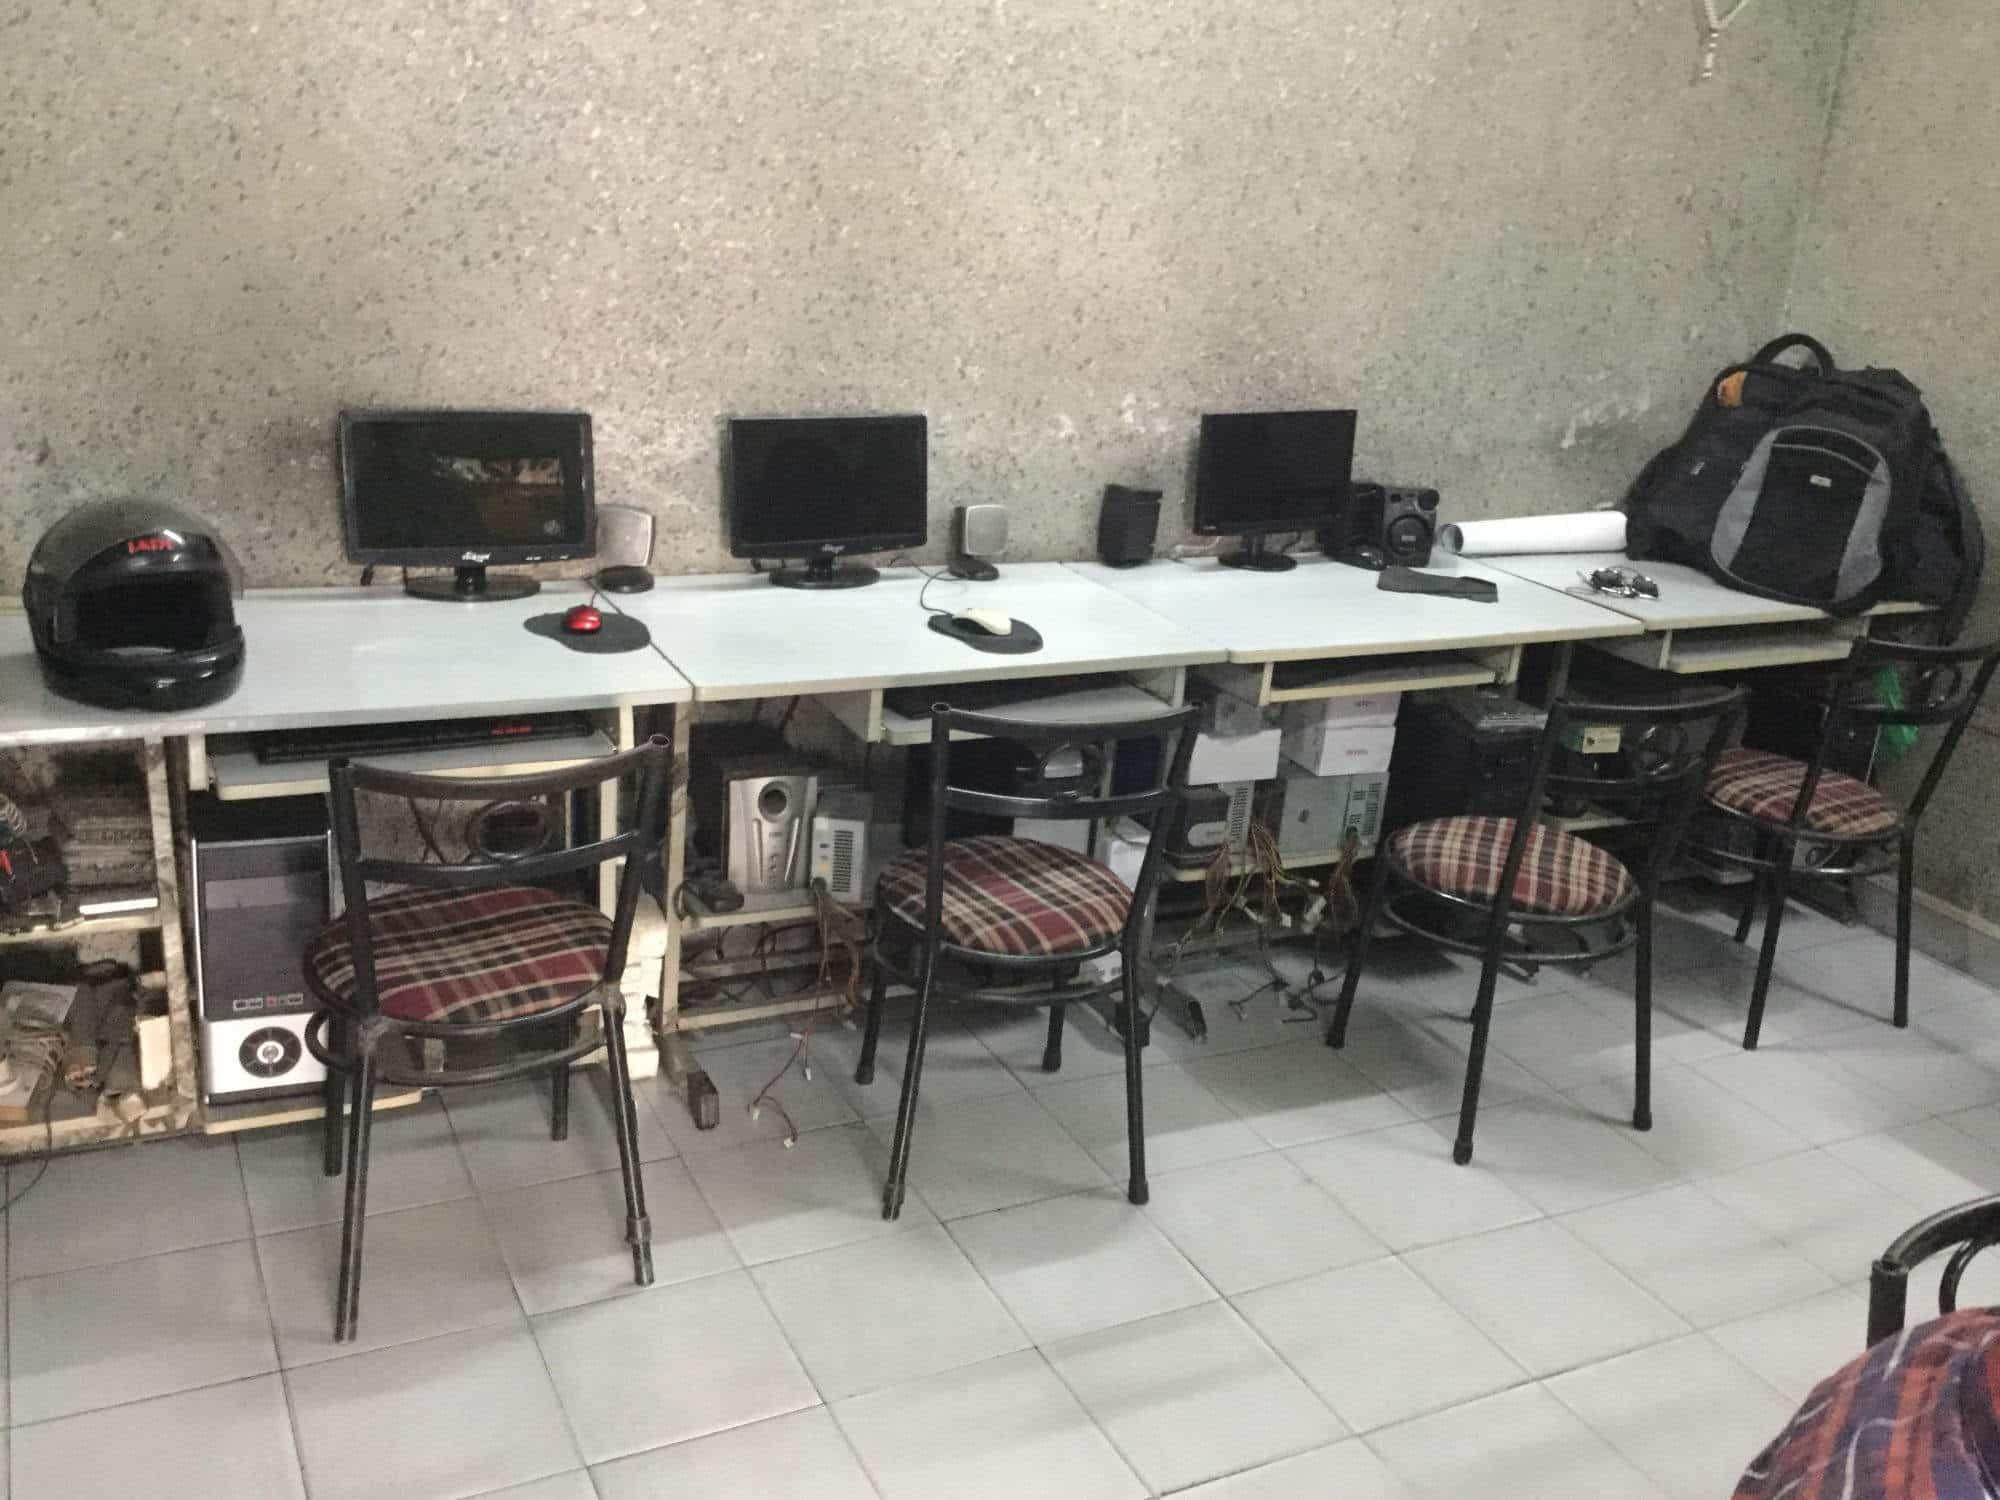 Unisys computer photos baba than singh chowk ludhiana pictures unisys computer photos baba than singh chowk ludhiana computer training institutes stopboris Image collections